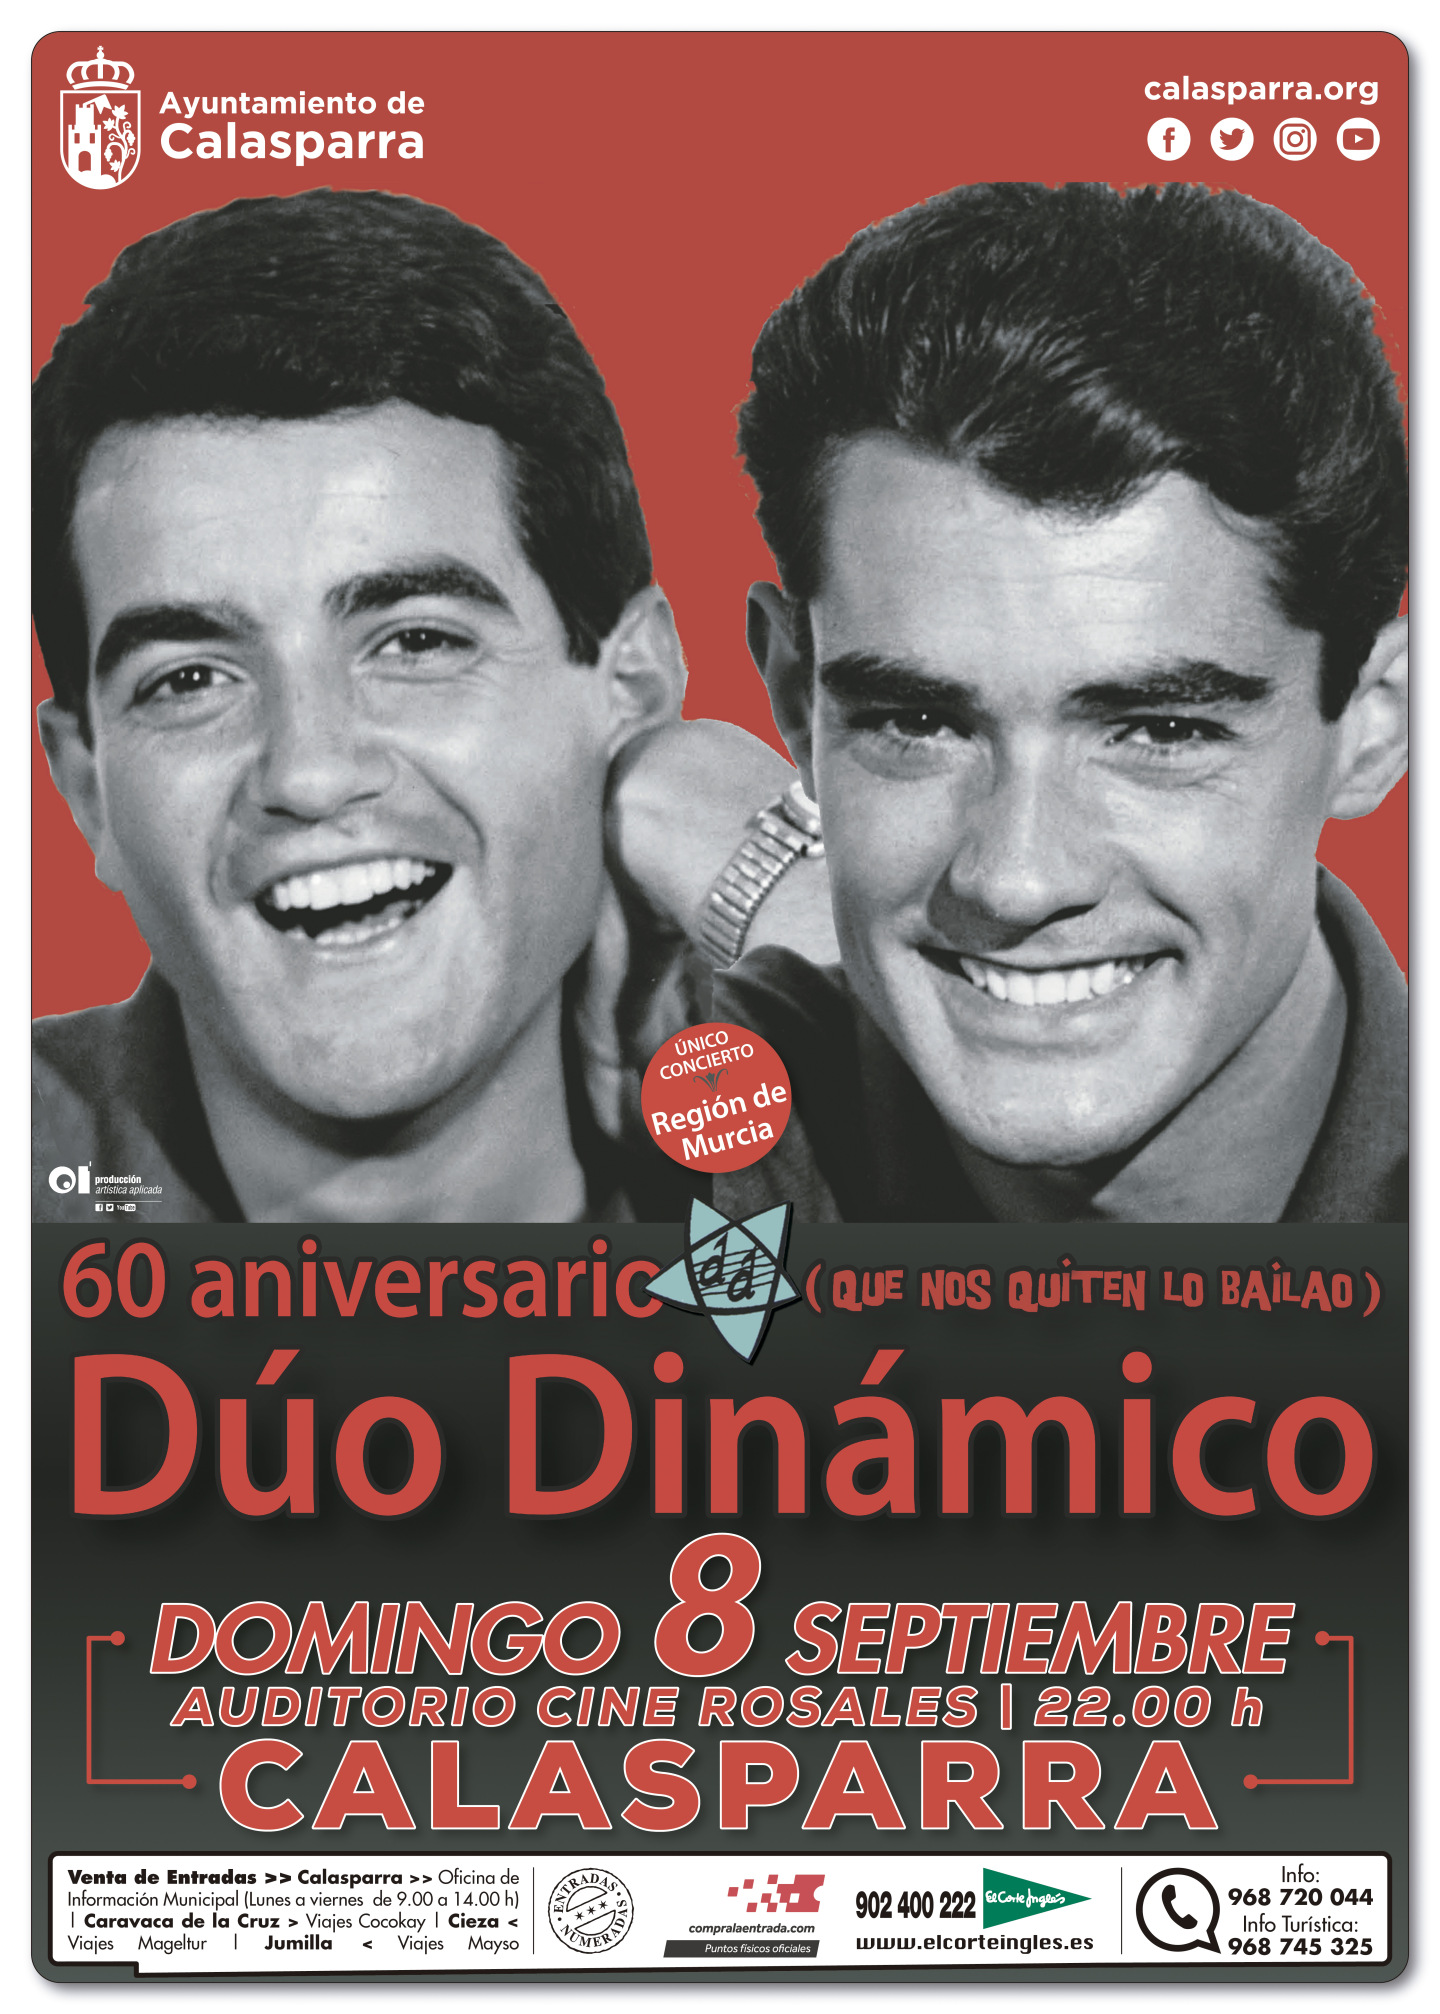 EL DÚO DINÁMICO | CALASPARRA | 08/09